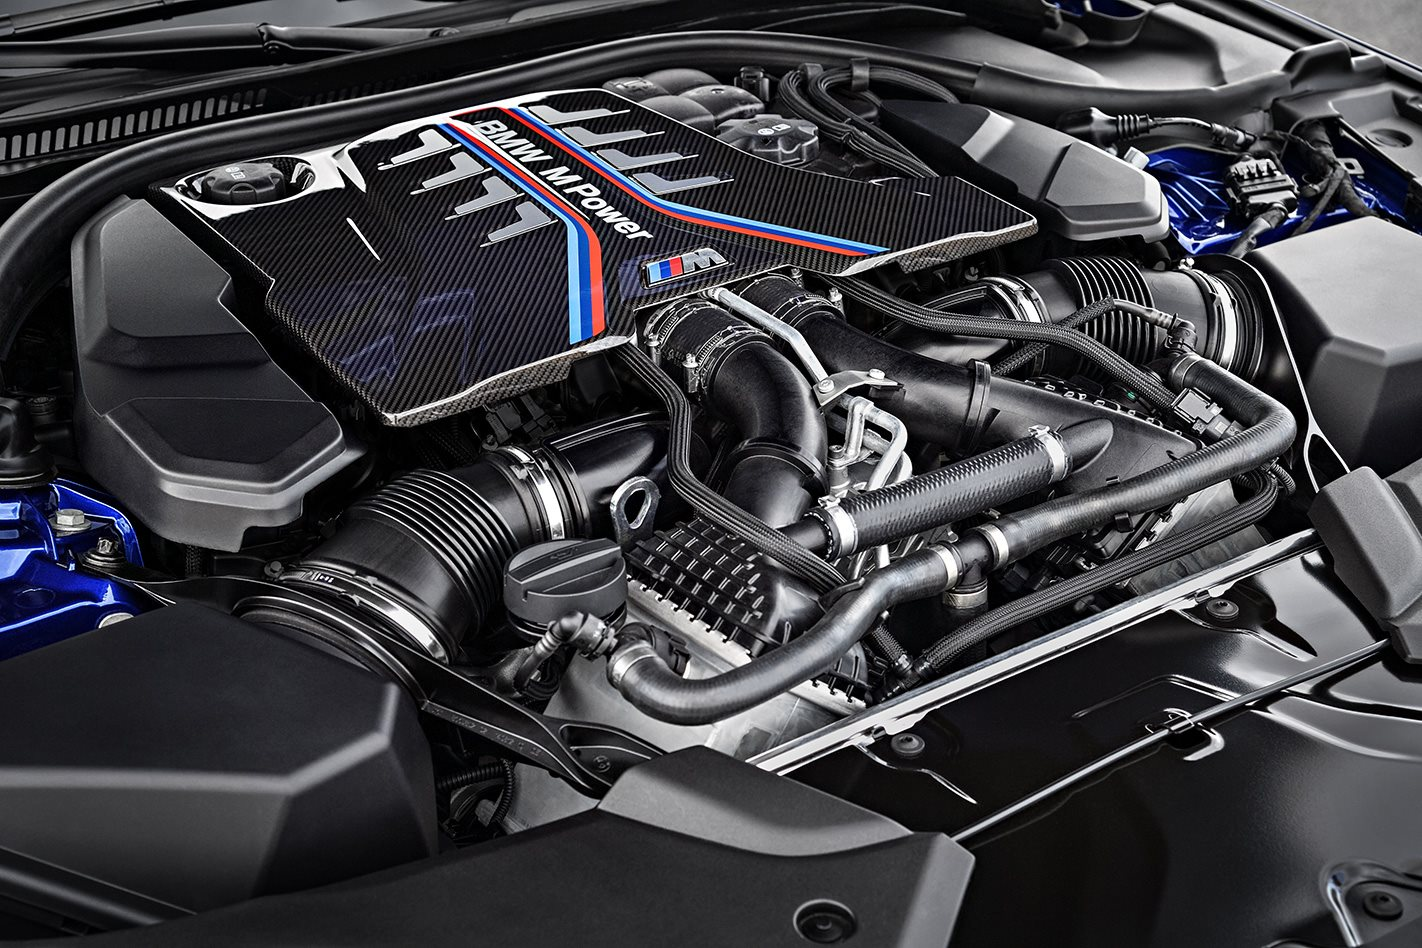 2018 BMW M5 engine